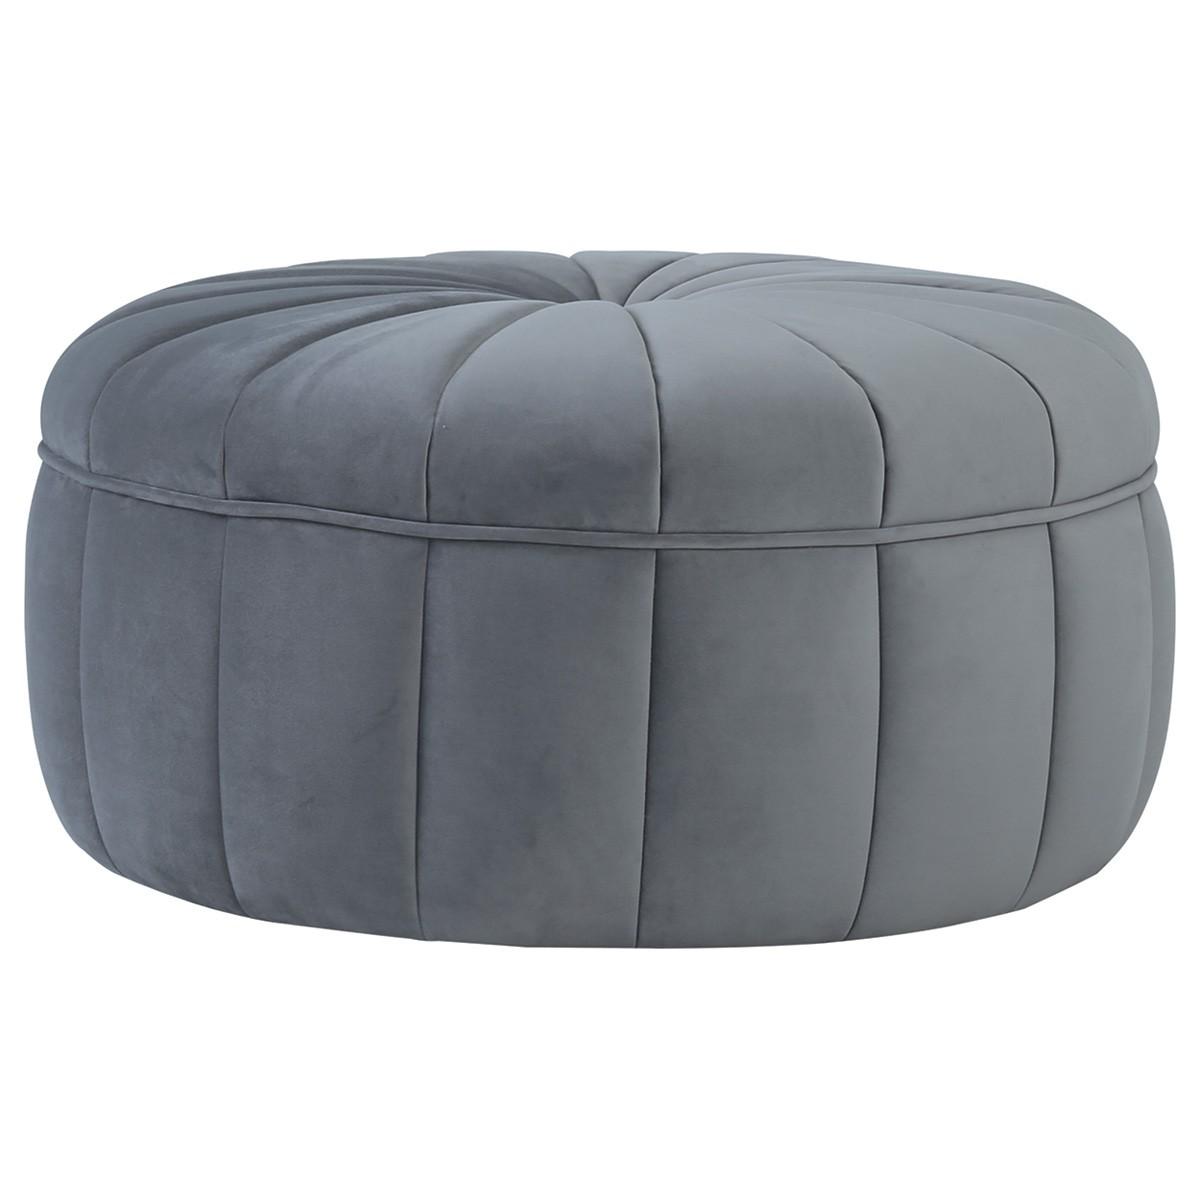 Probe Fabric Round Ottoman, Grey